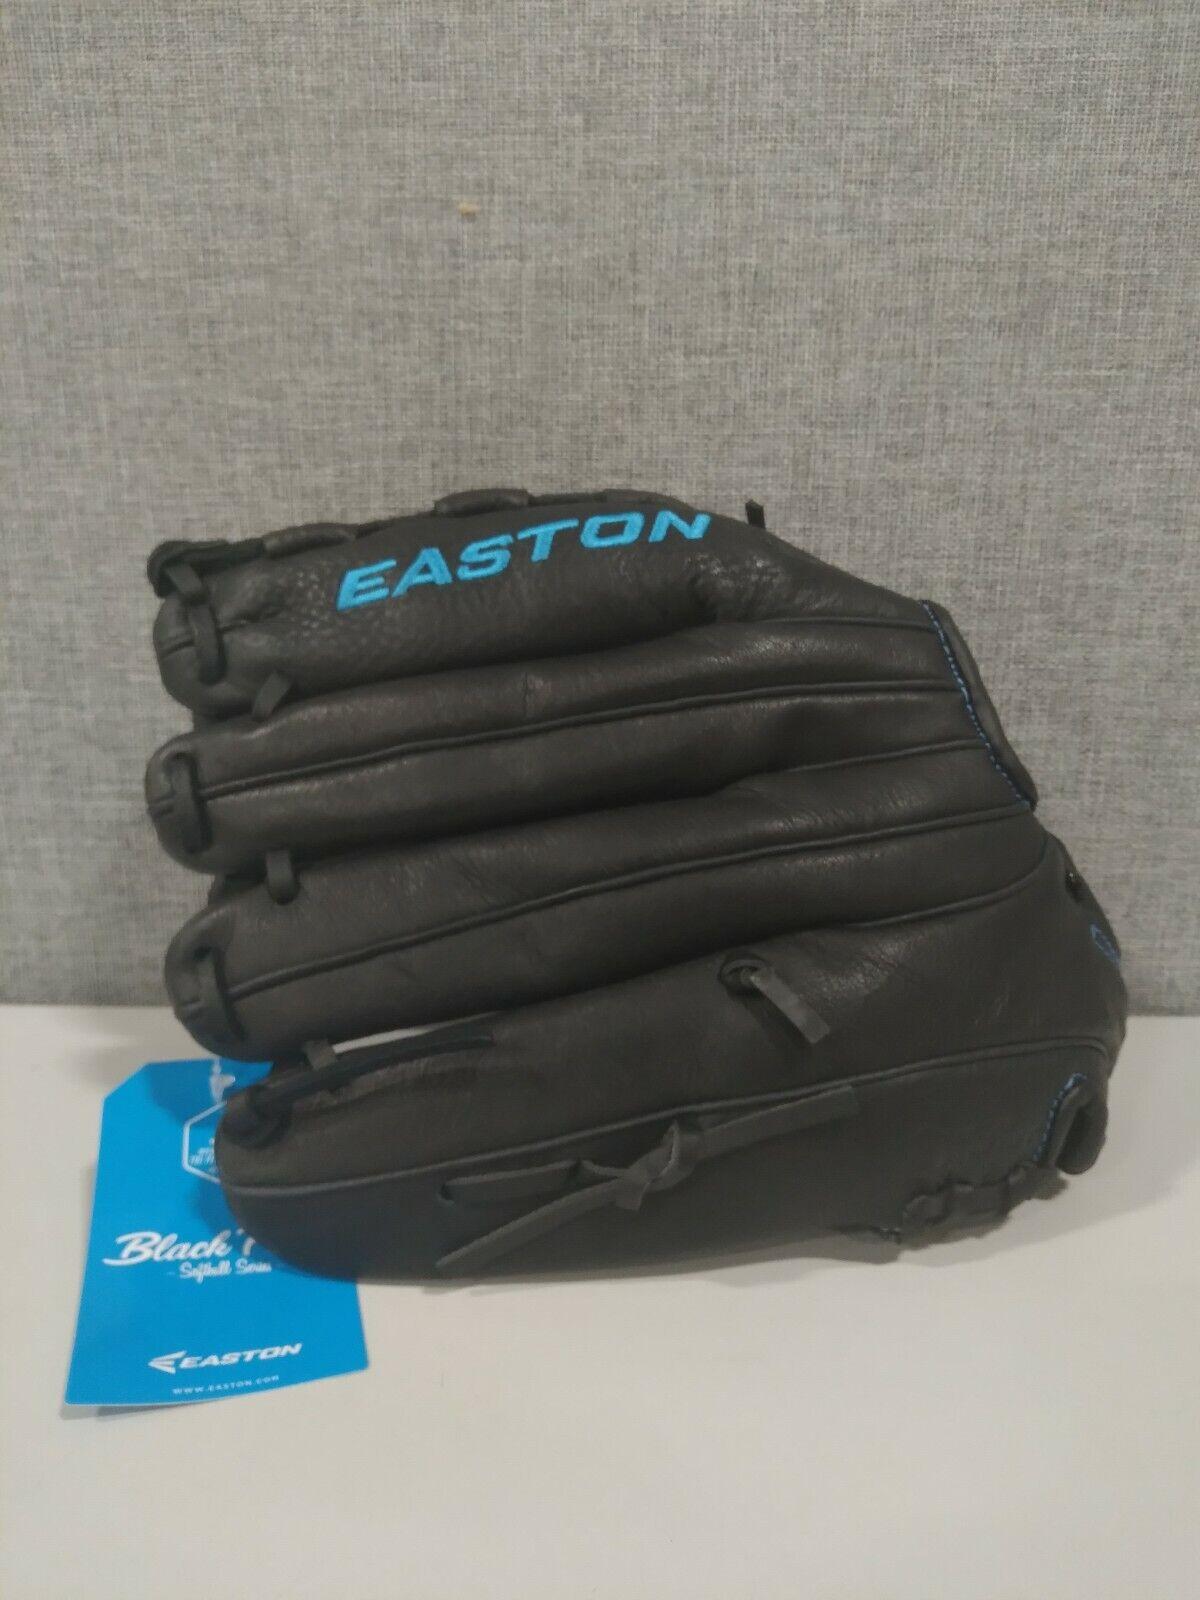 EASTON BLACK PEARL Fastpitch Softball Glove Series- Left Hand Throw - New - $37.00